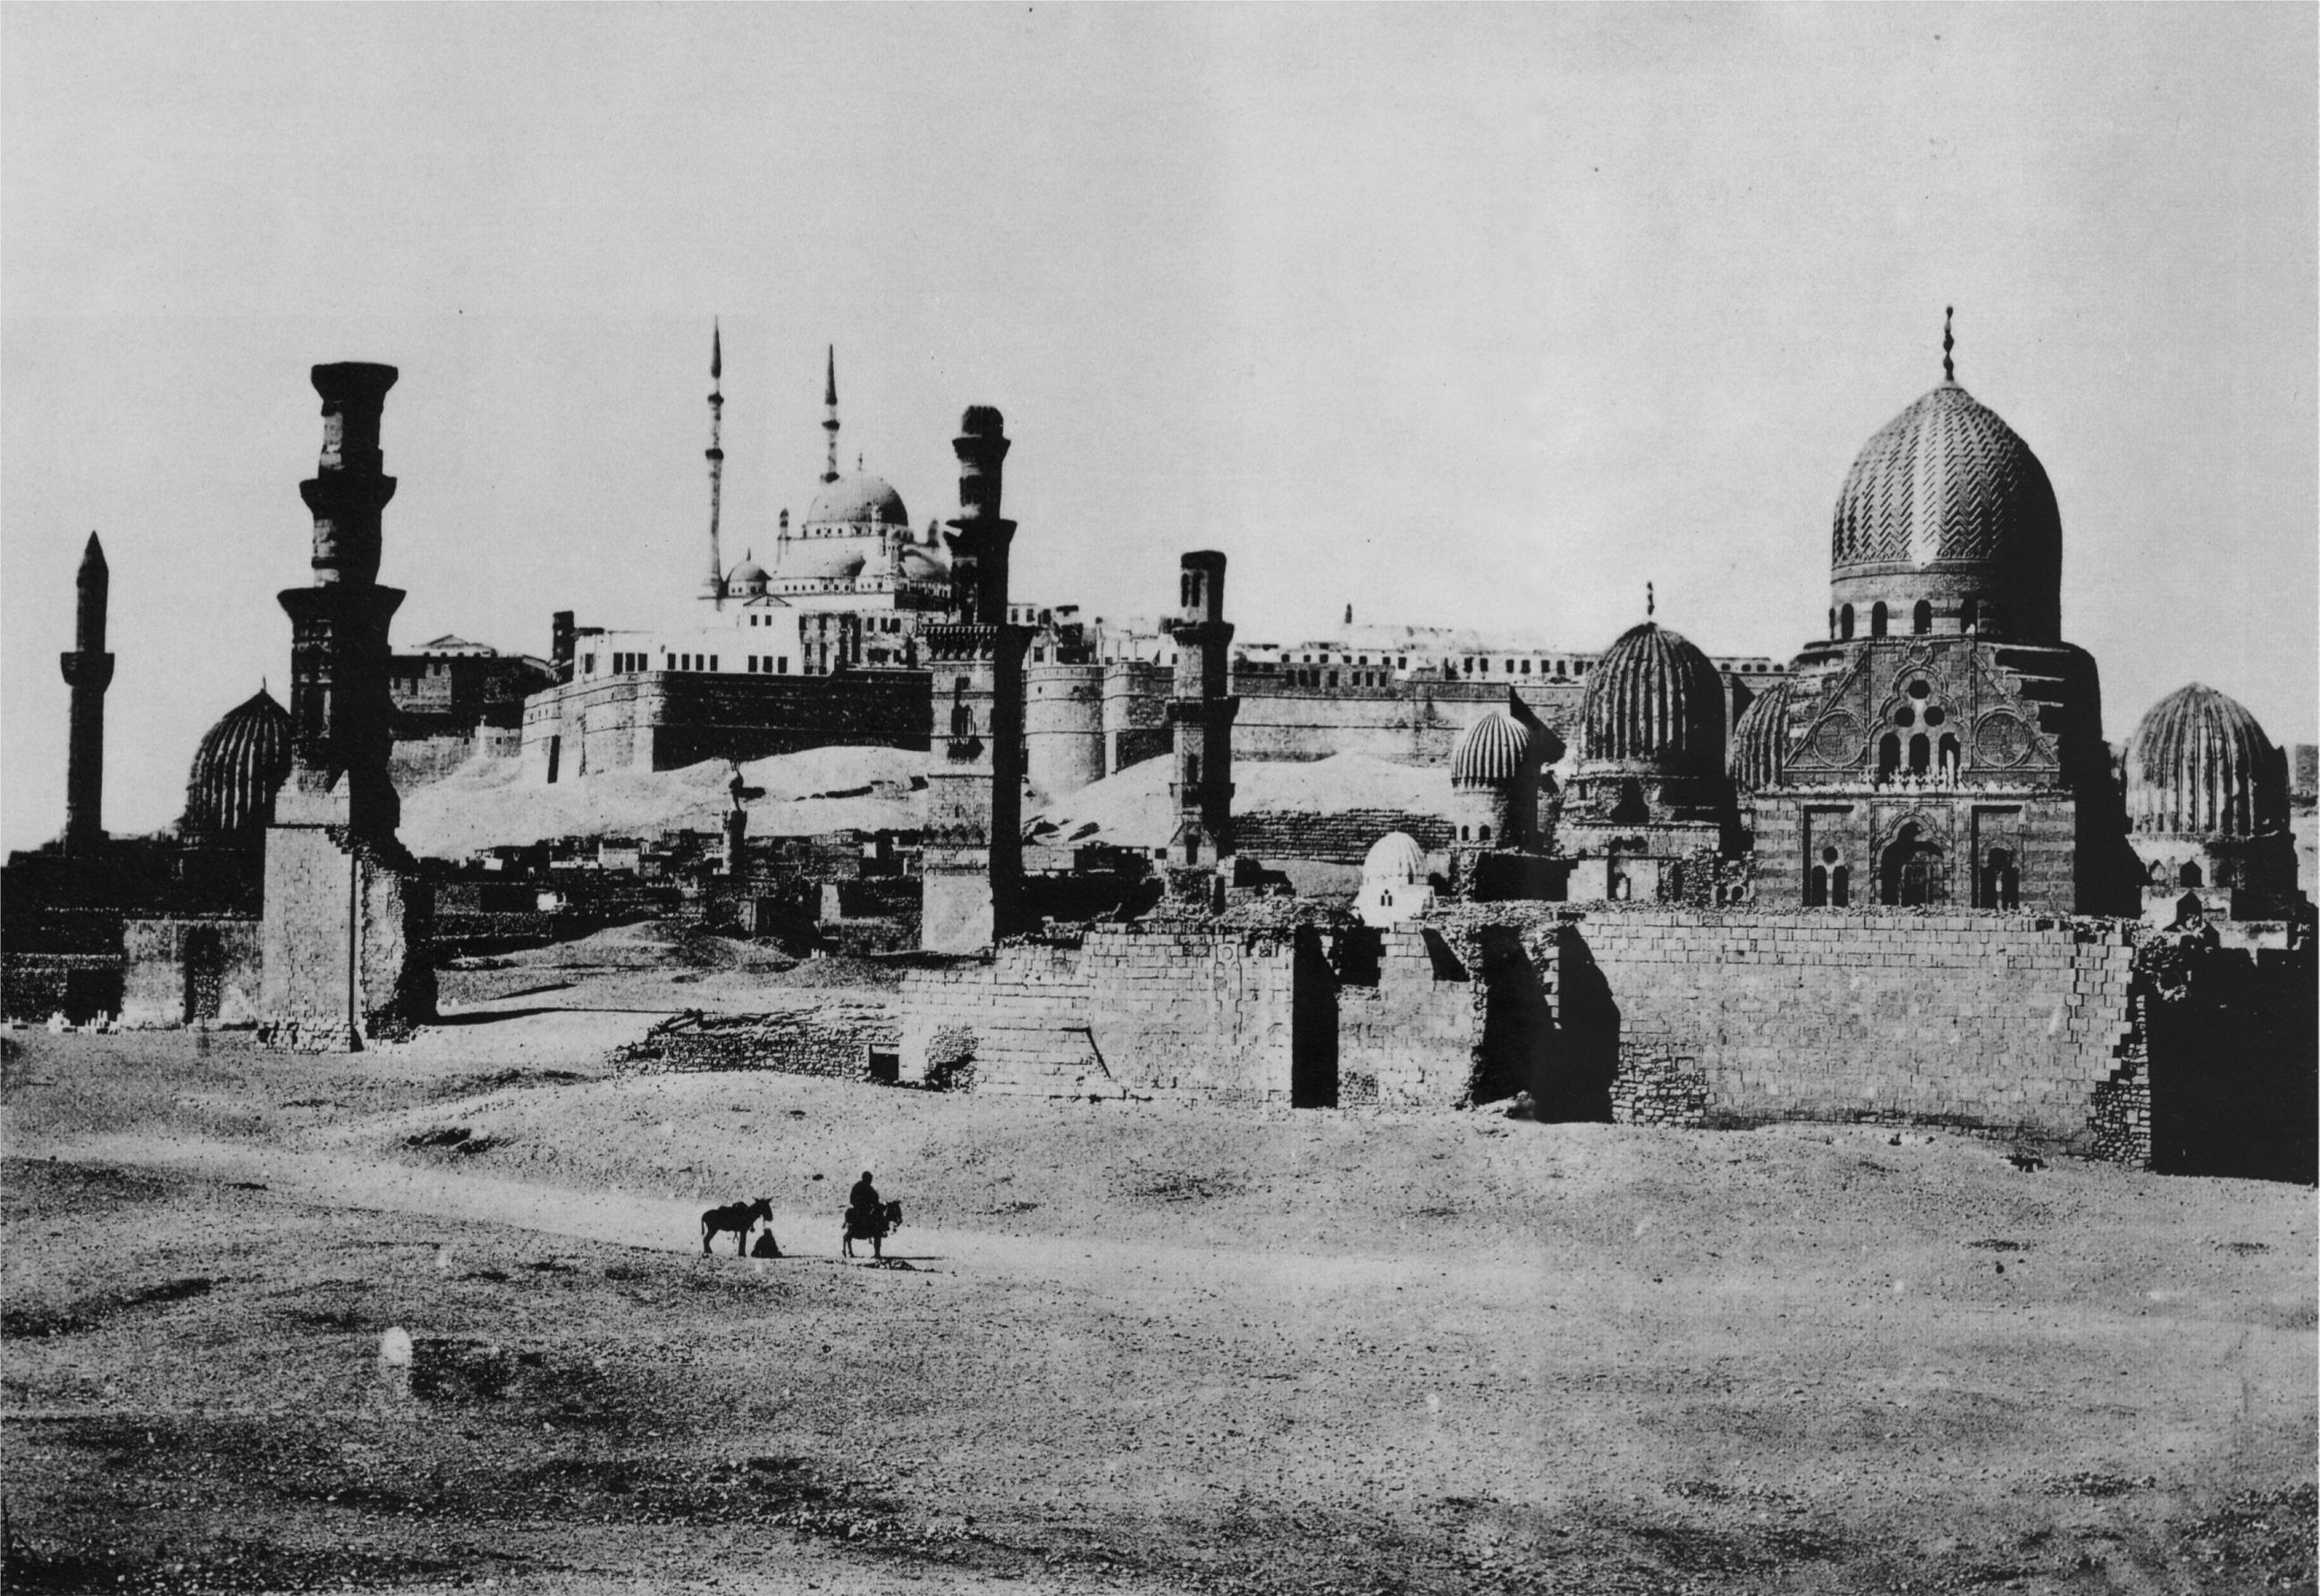 File:Kairo 1856 (Francis Frith).jpg